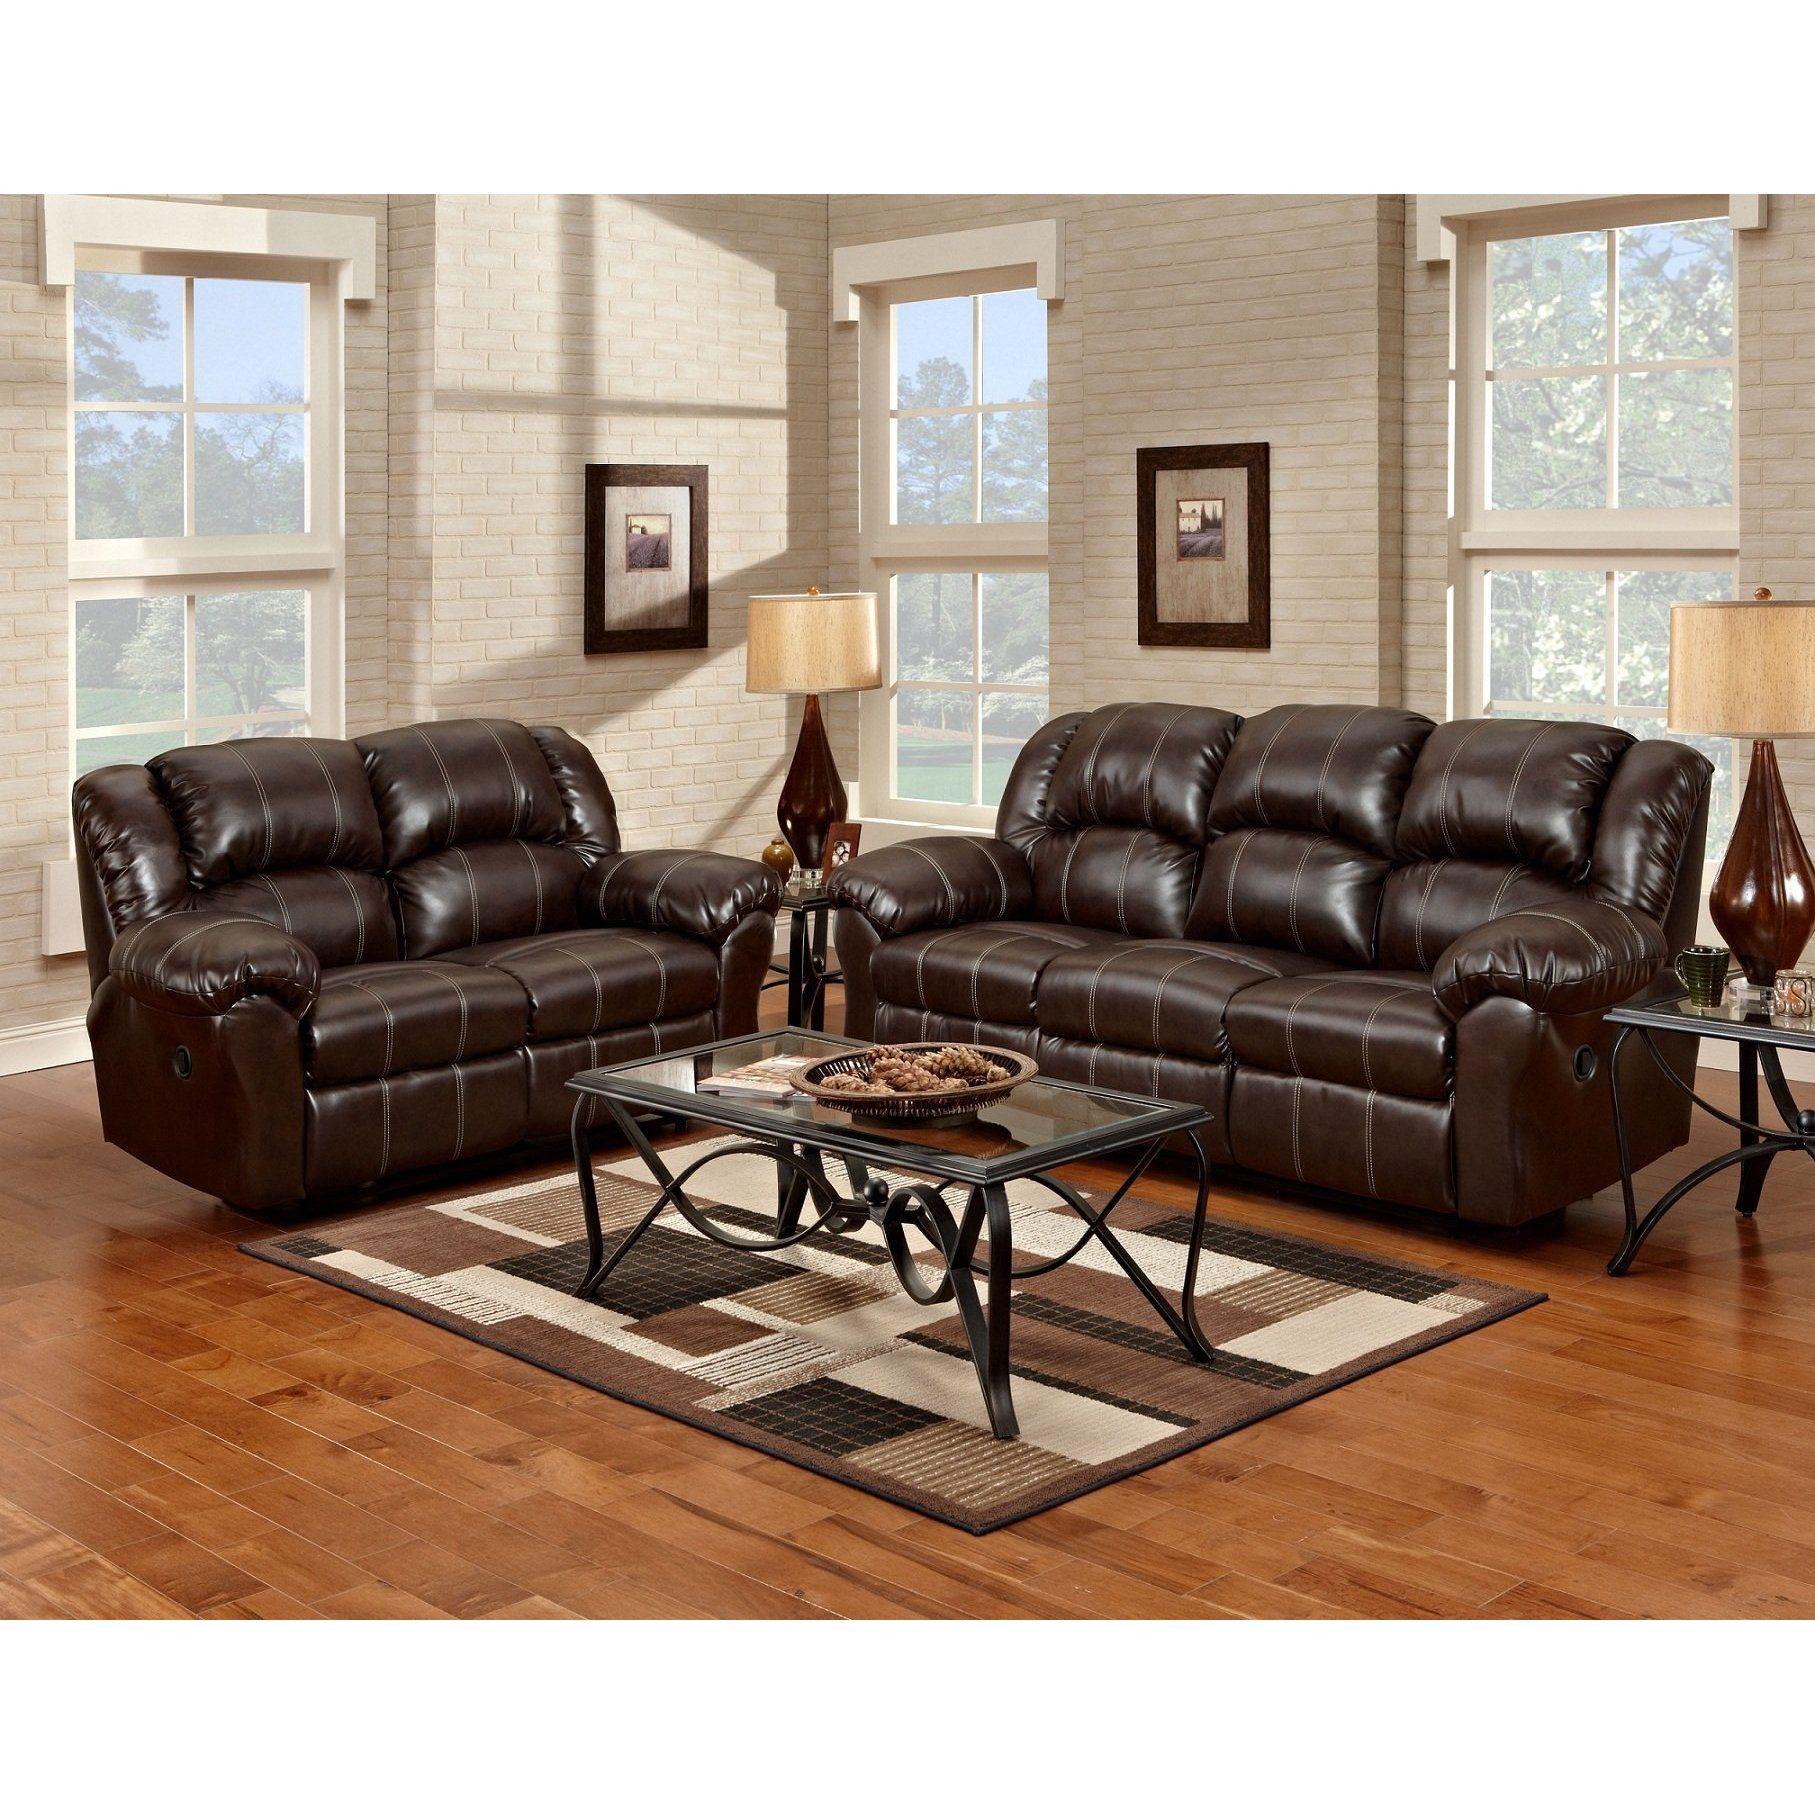 Furniturema Dual Reclining Brown